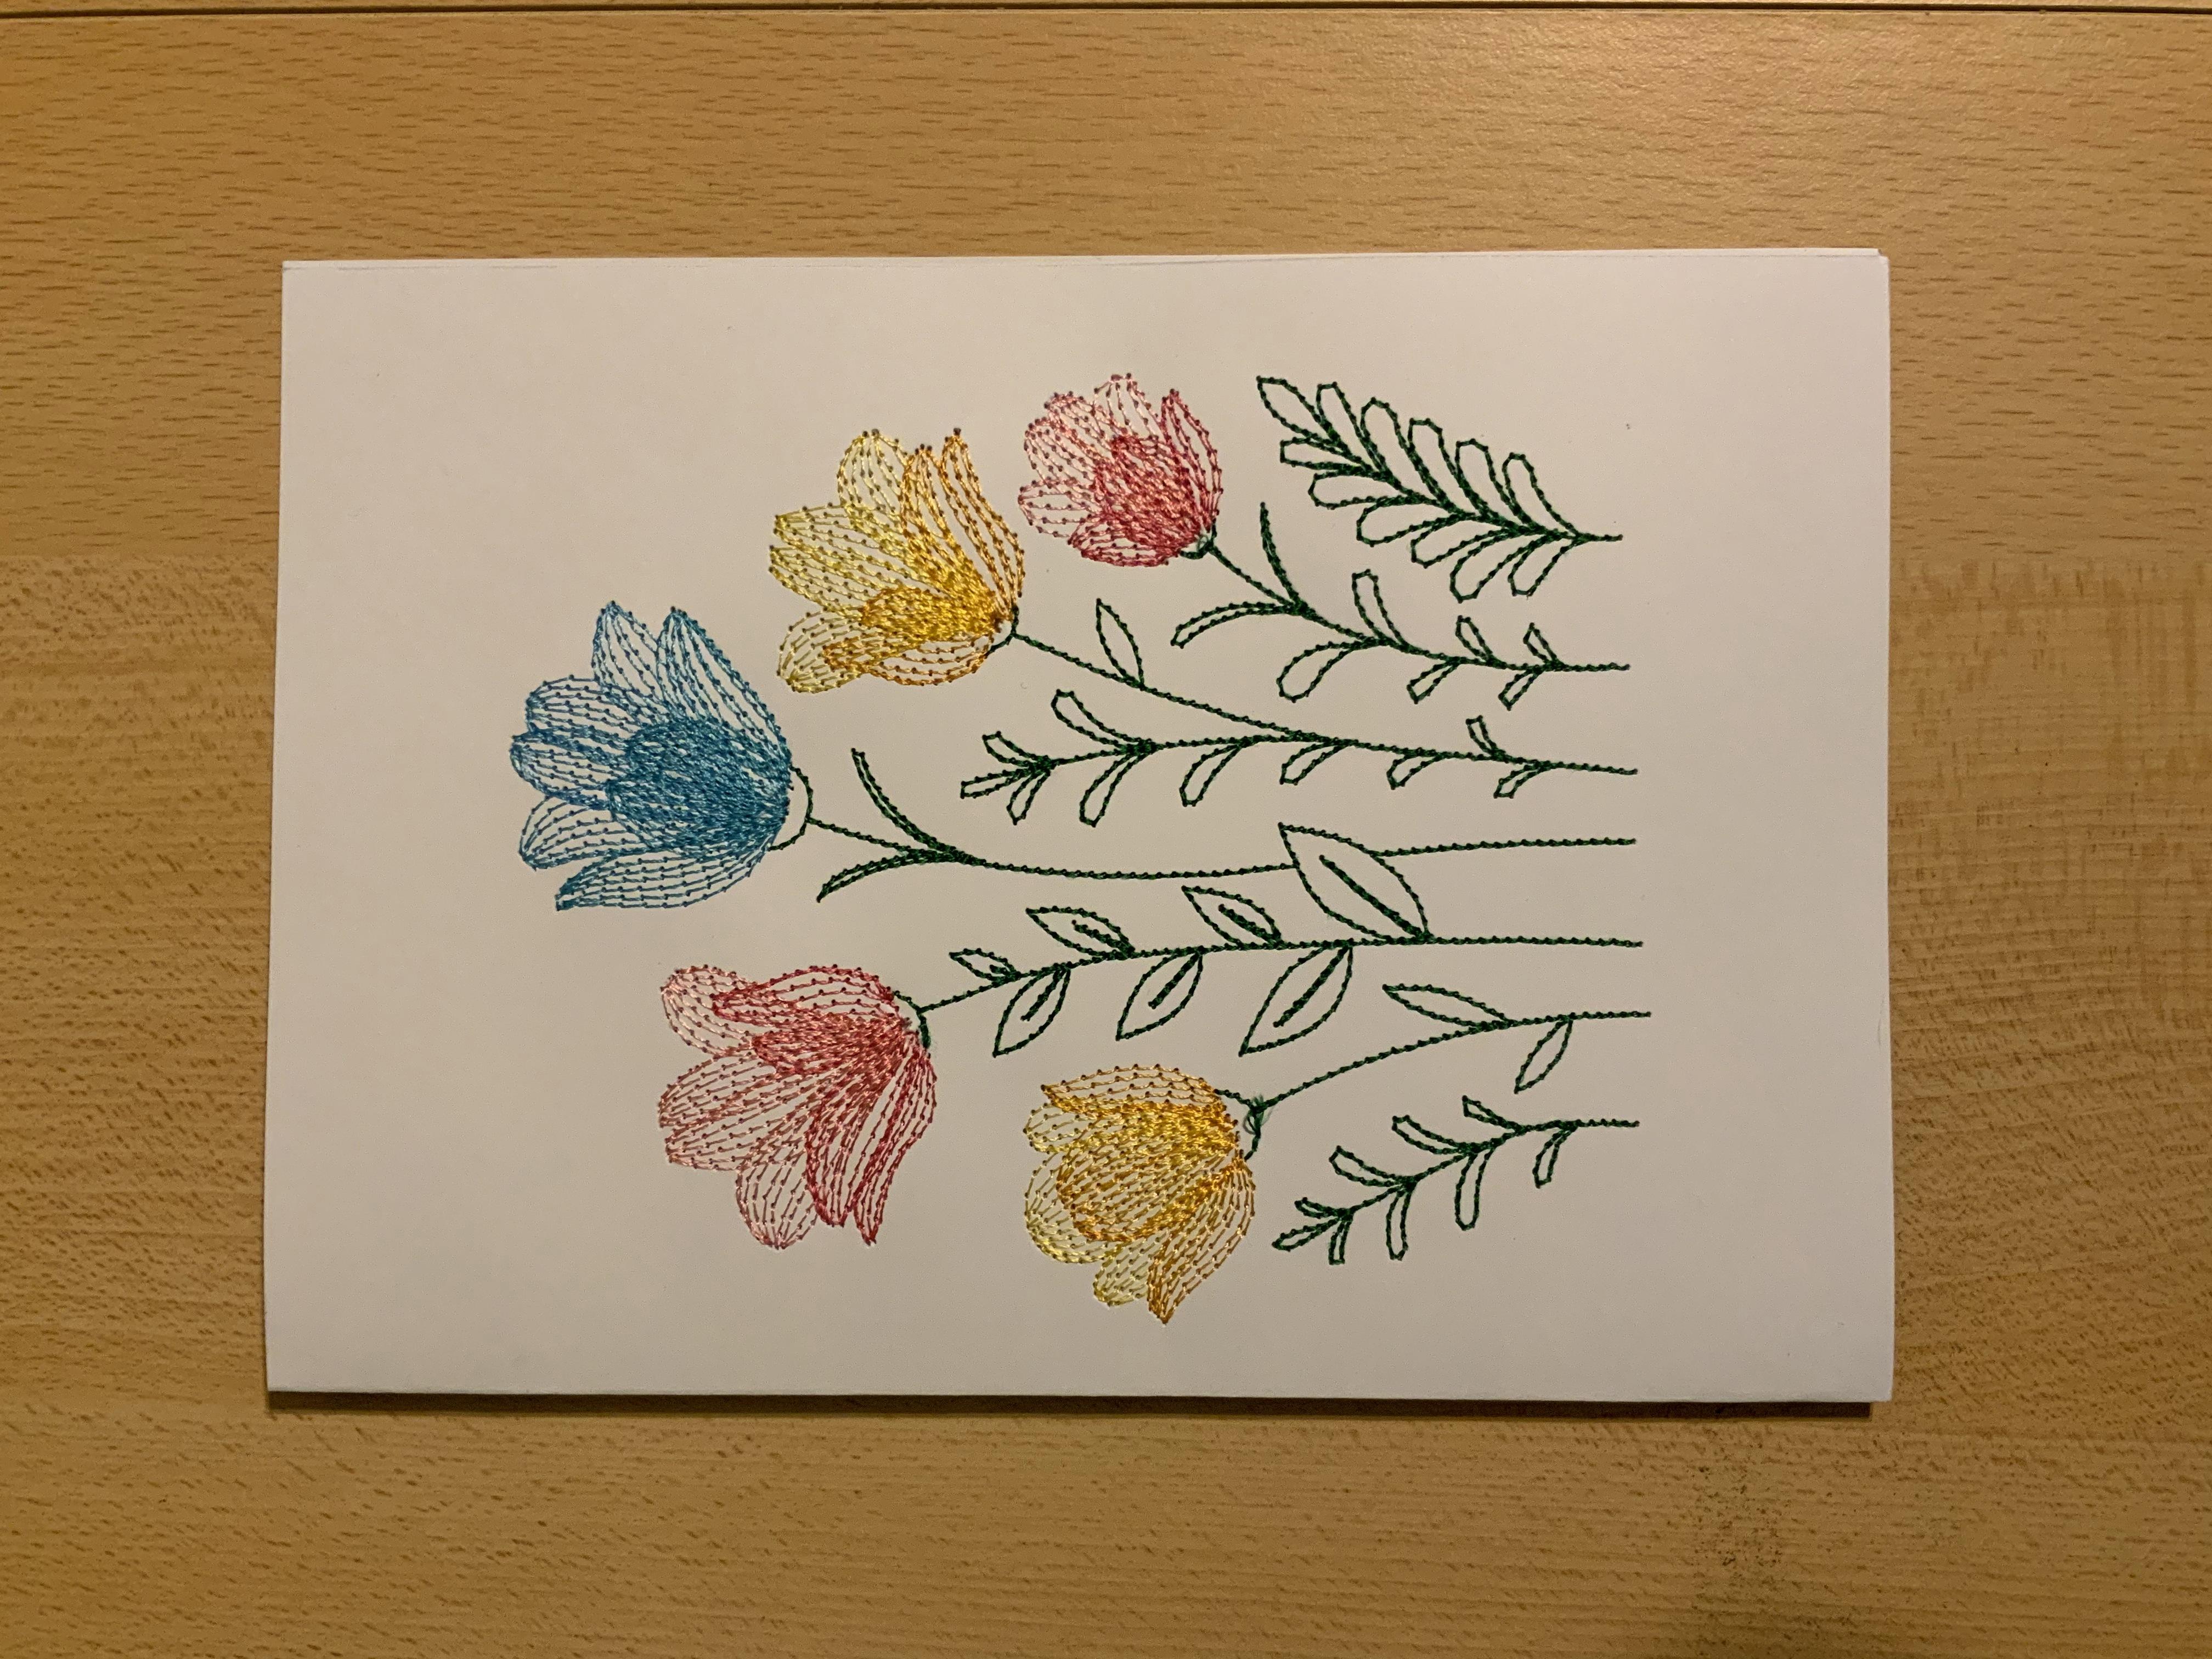 EmbroideredCards/IMG_3834.jpg